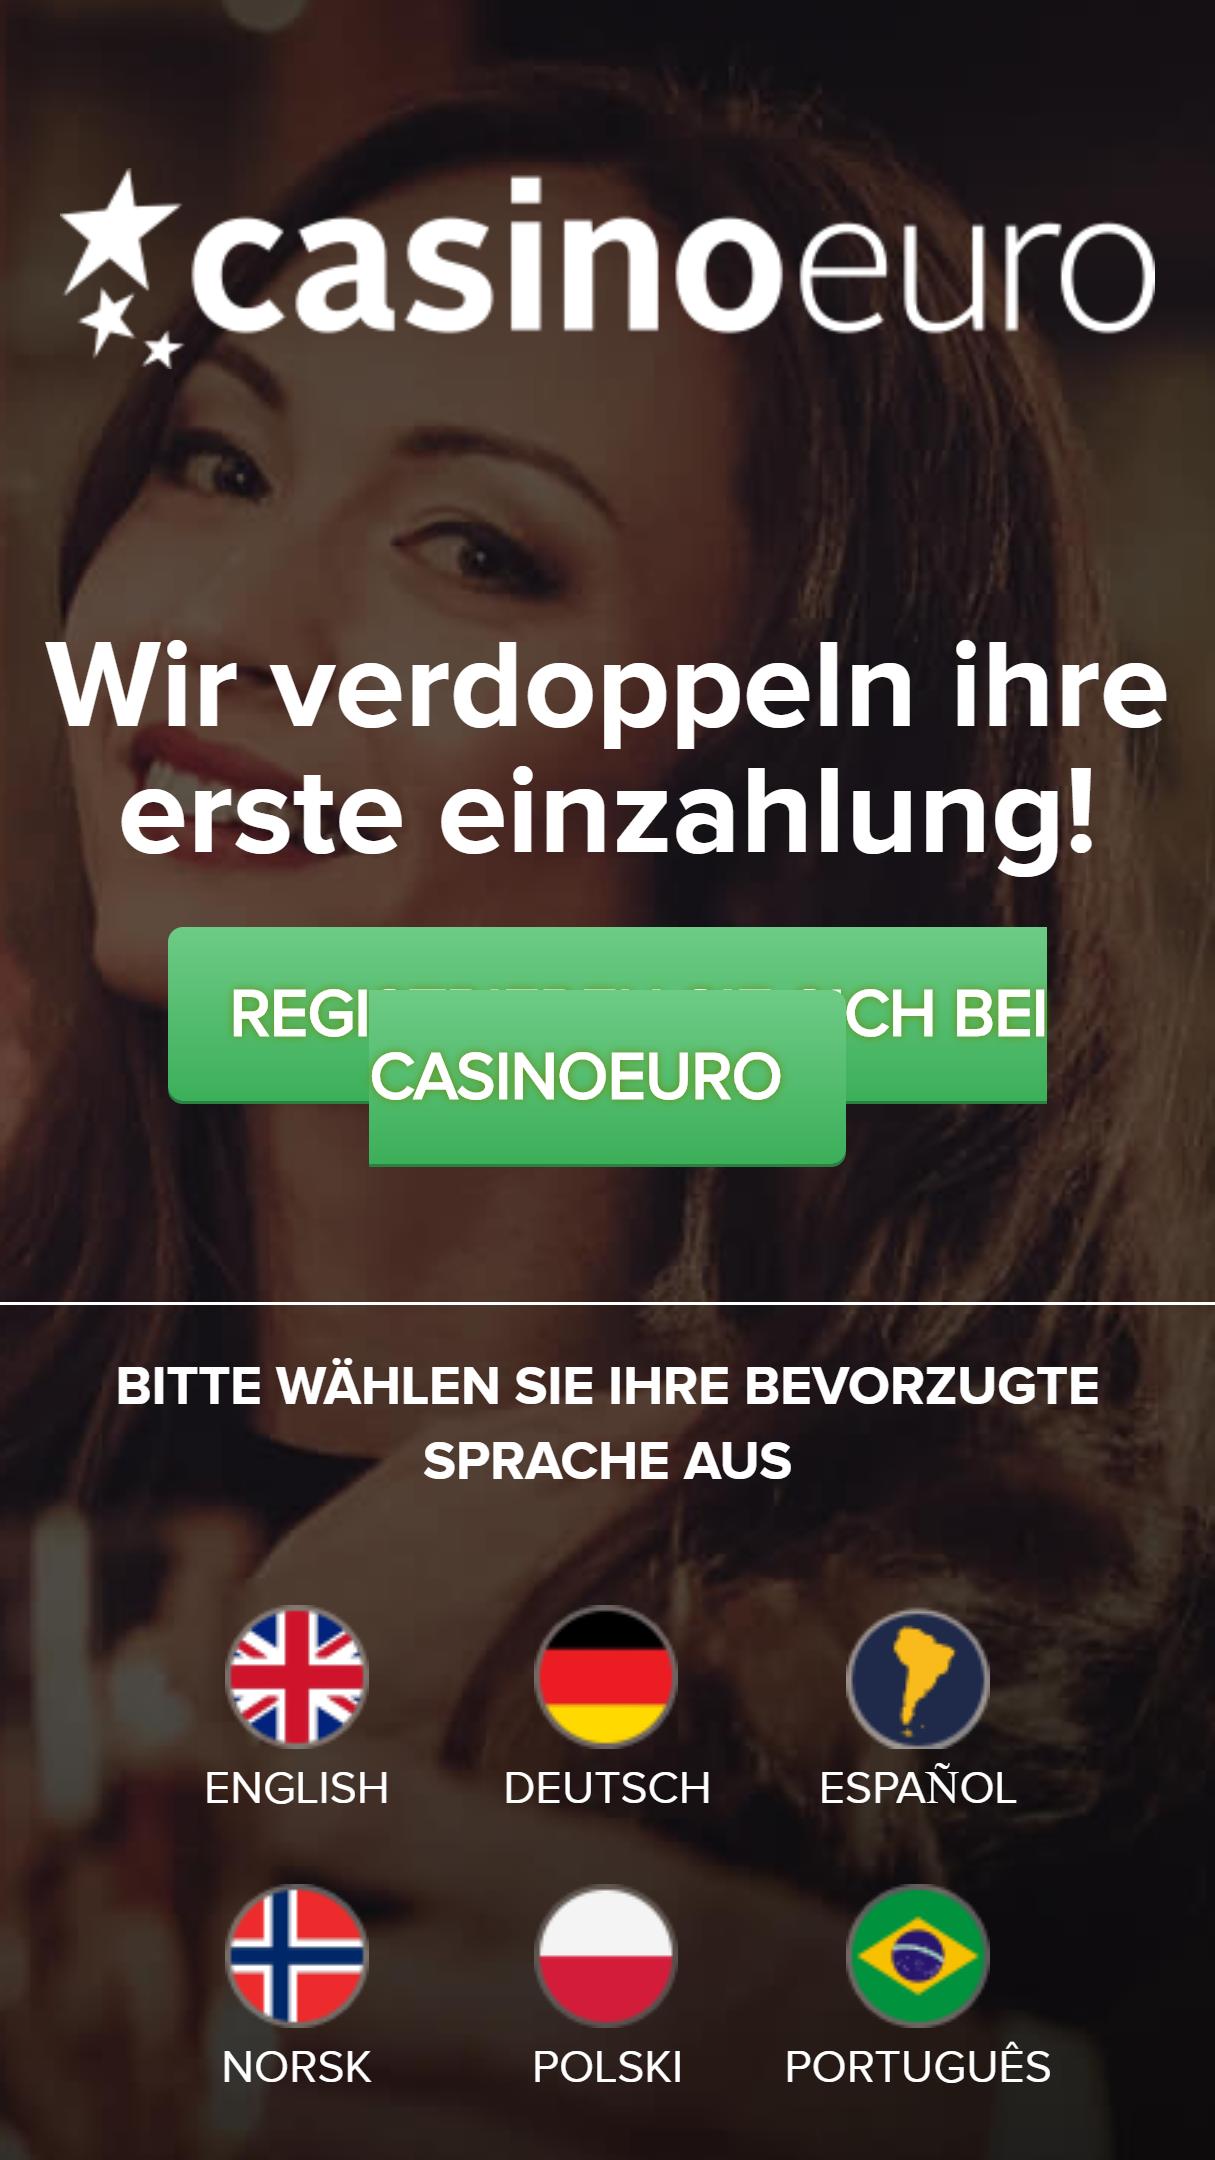 casinoeuro.com